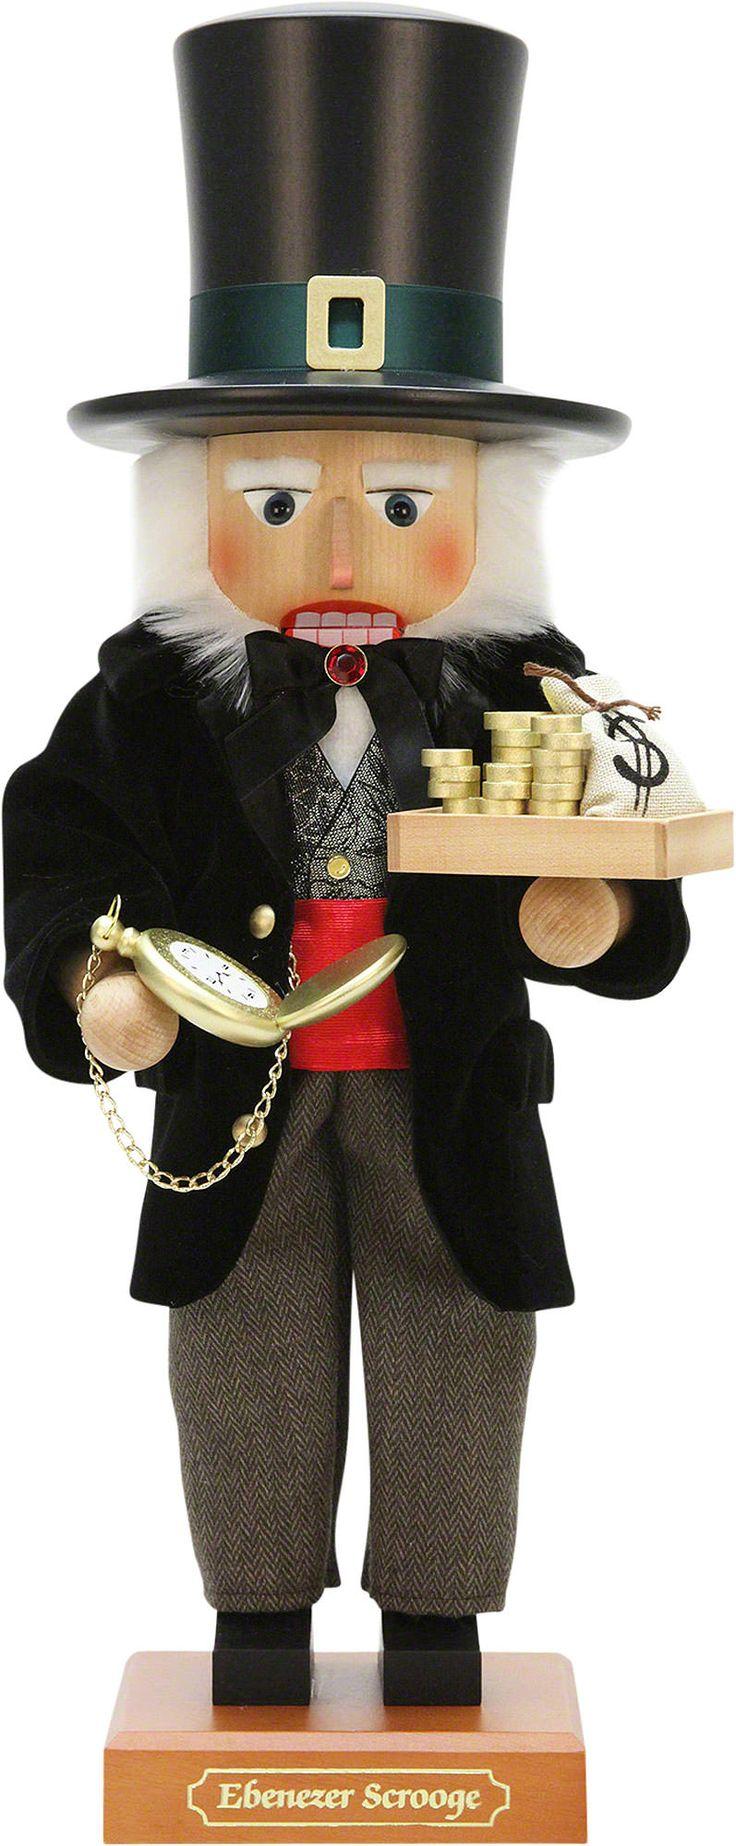 Nutcracker Ebenezer Scrooge, limited - 51,5cm / 20.3inch